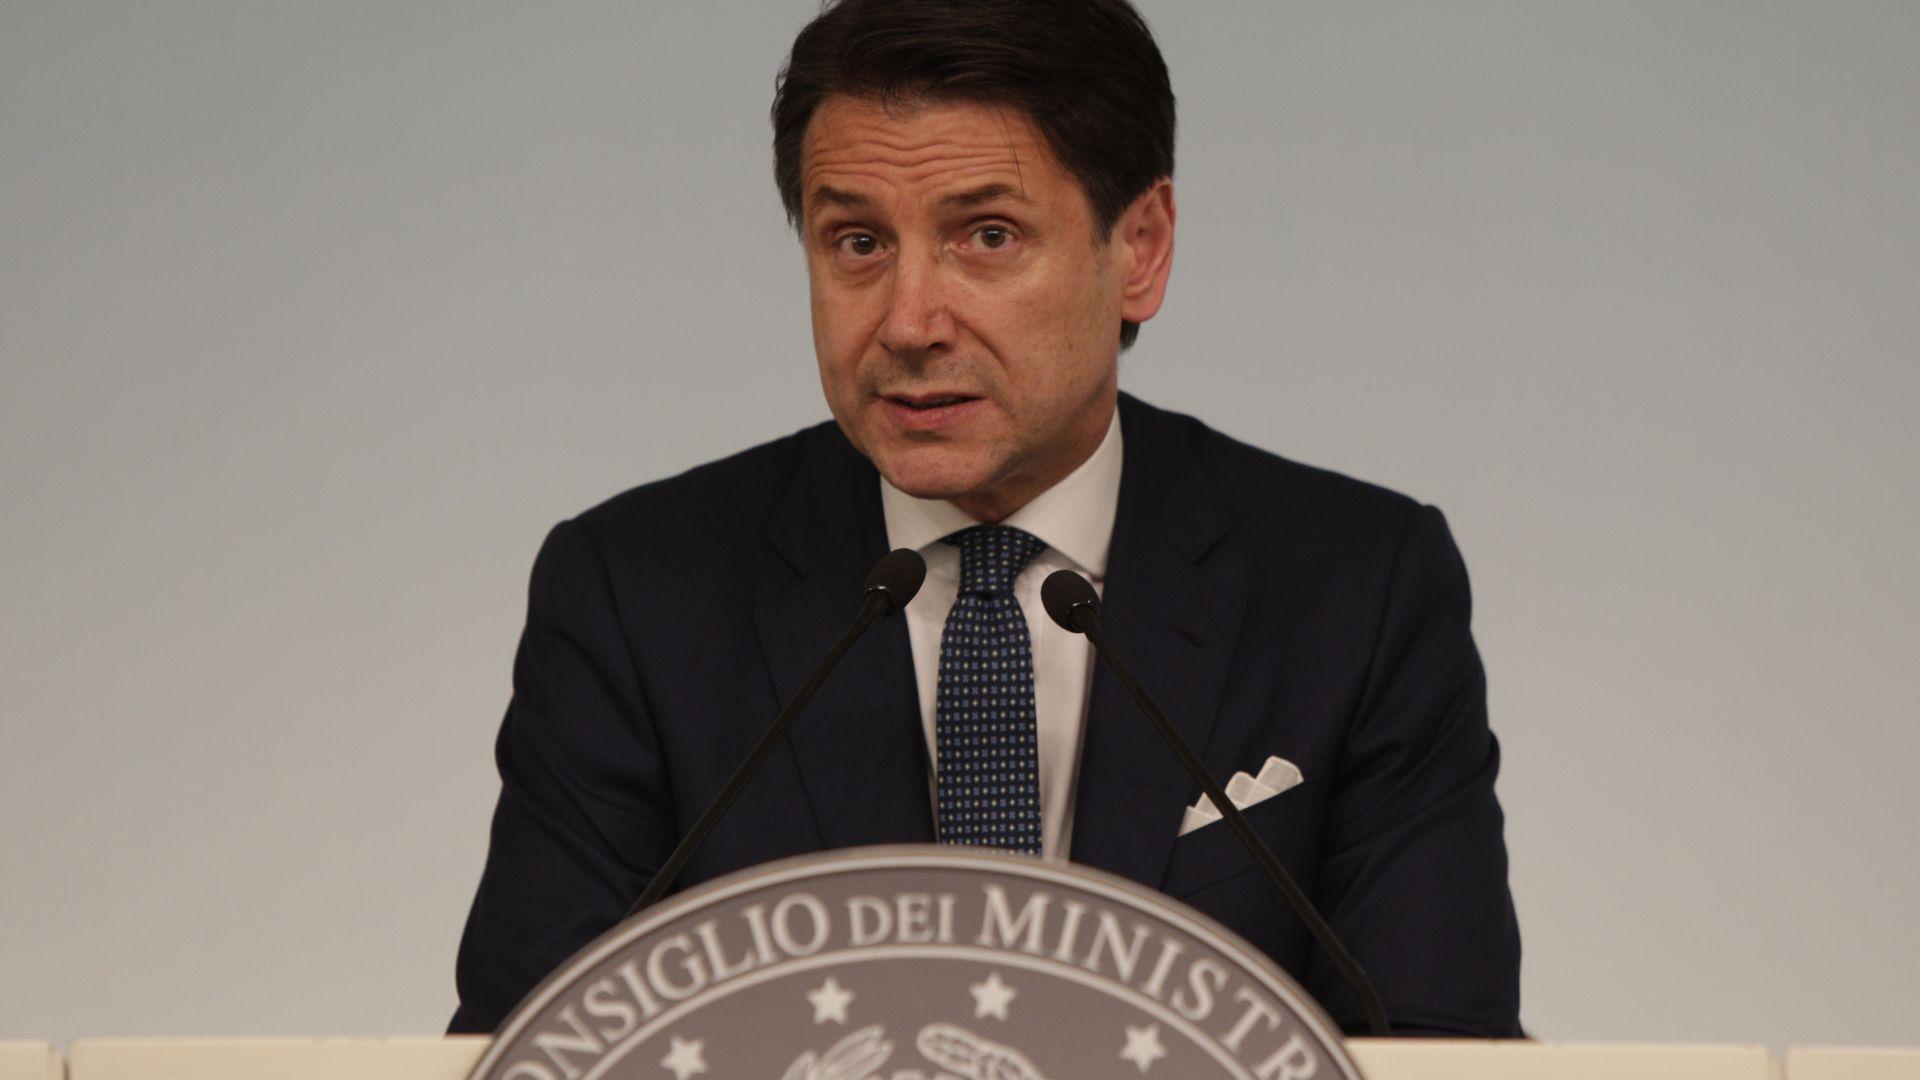 Политическа криза в Италия: Какво предстои?